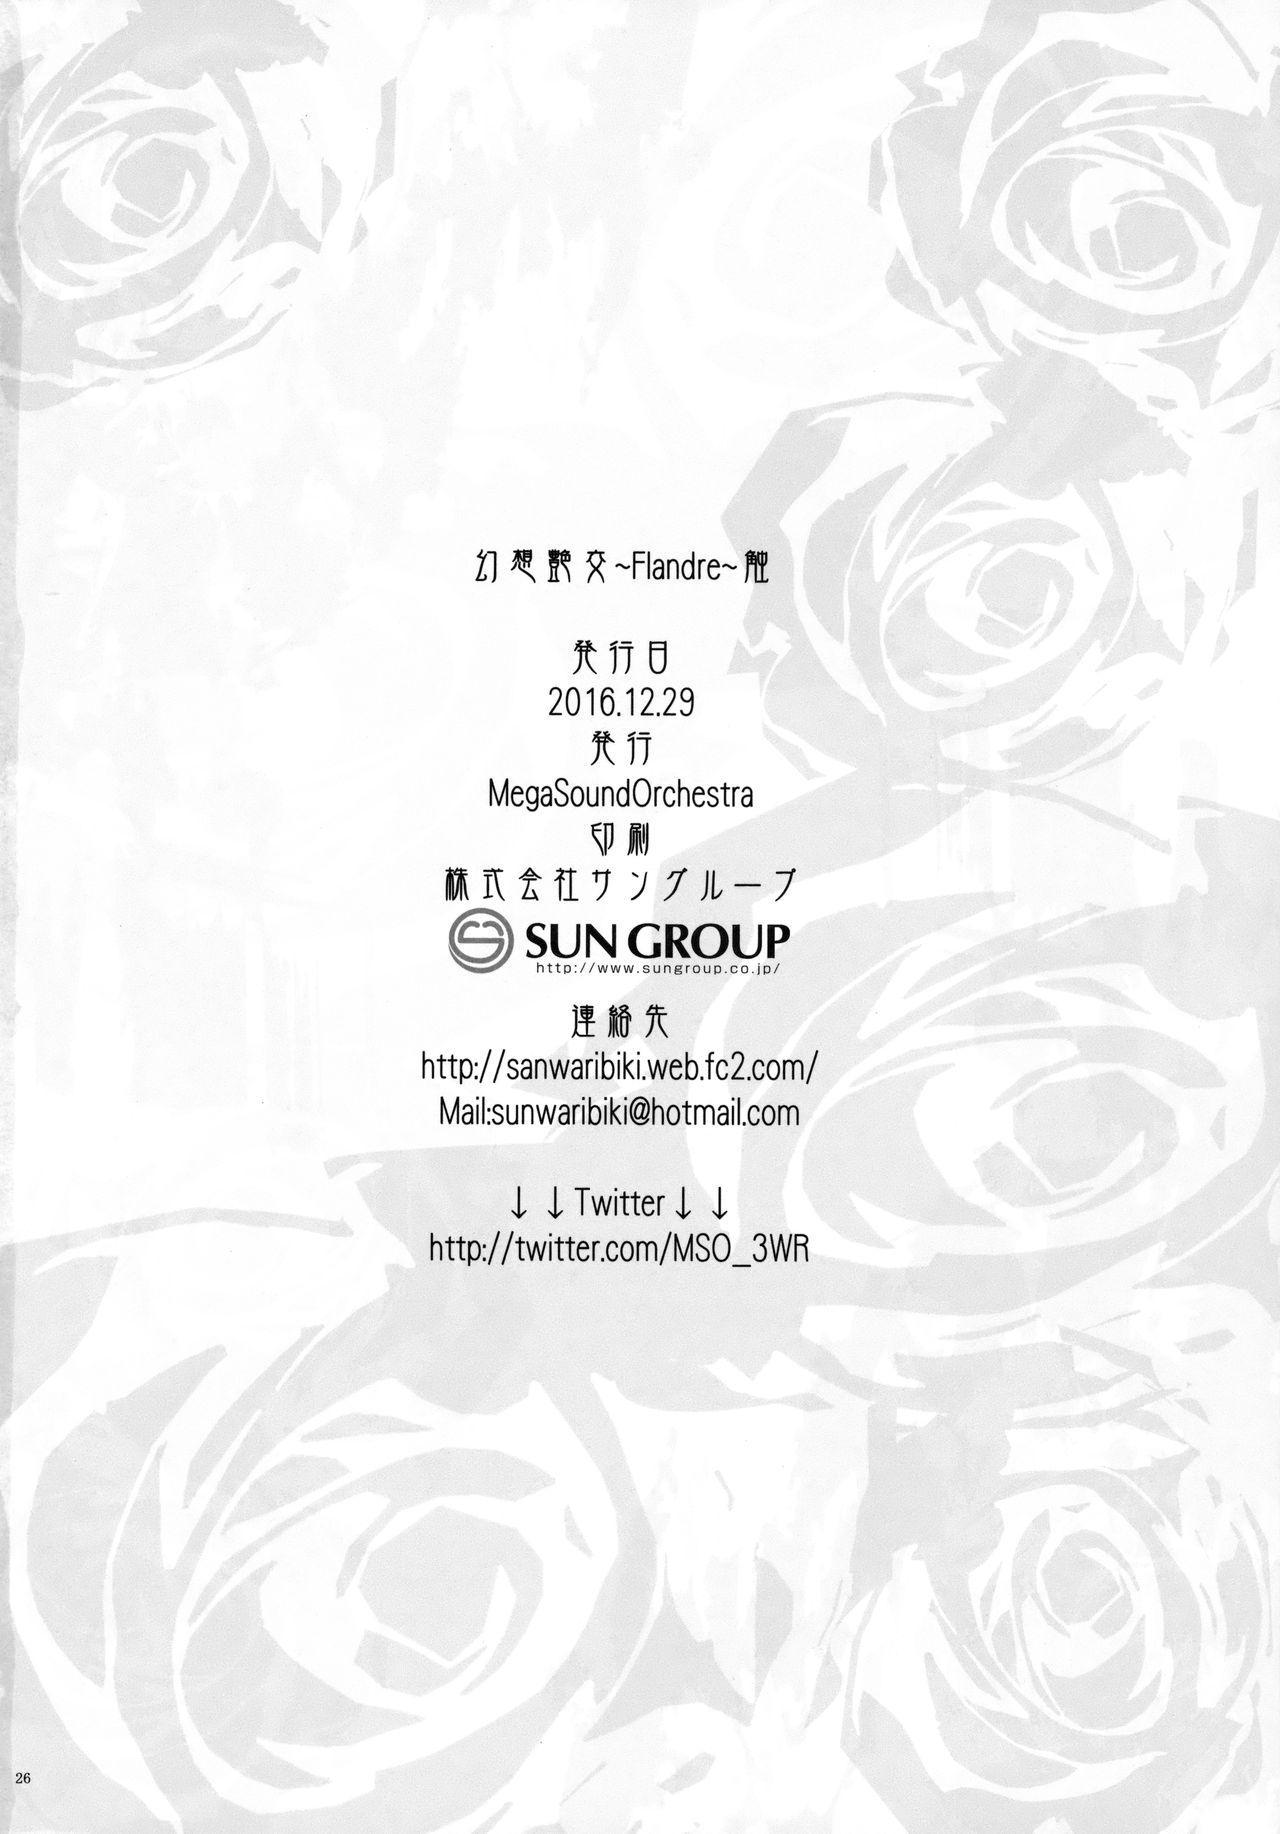 (C91) [MegaSoundOrchestra (Sanwaribiki)] Gensou Enkou -Flandre- Shoku (Touhou Project) [English] [SMDC] 25